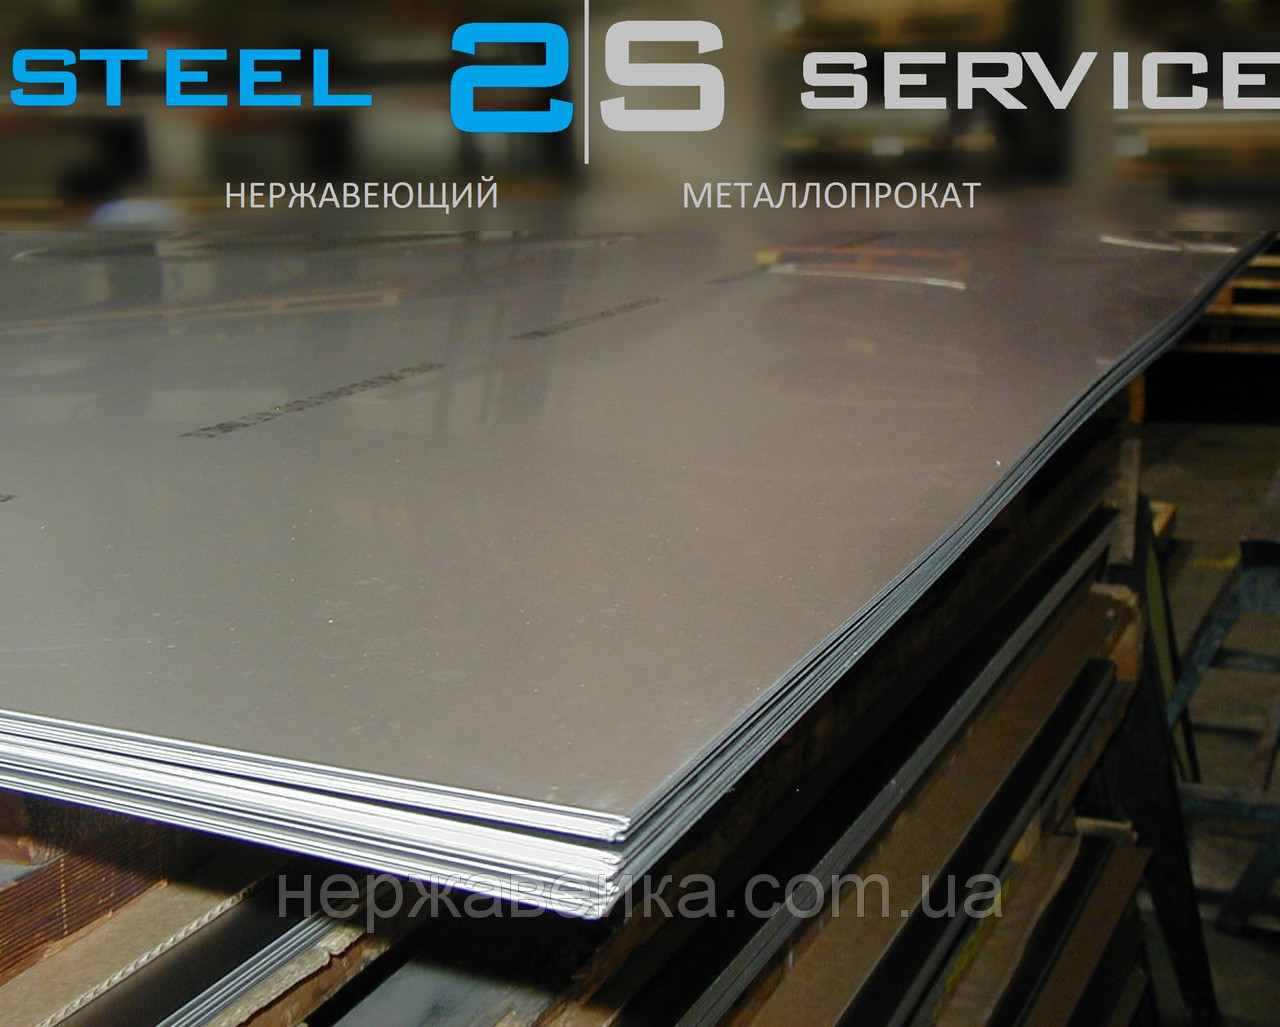 Нержавейка лист 0,8х1250х2500мм  AISI 321(08Х18Н10Т) 2B - матовый,  пищевой